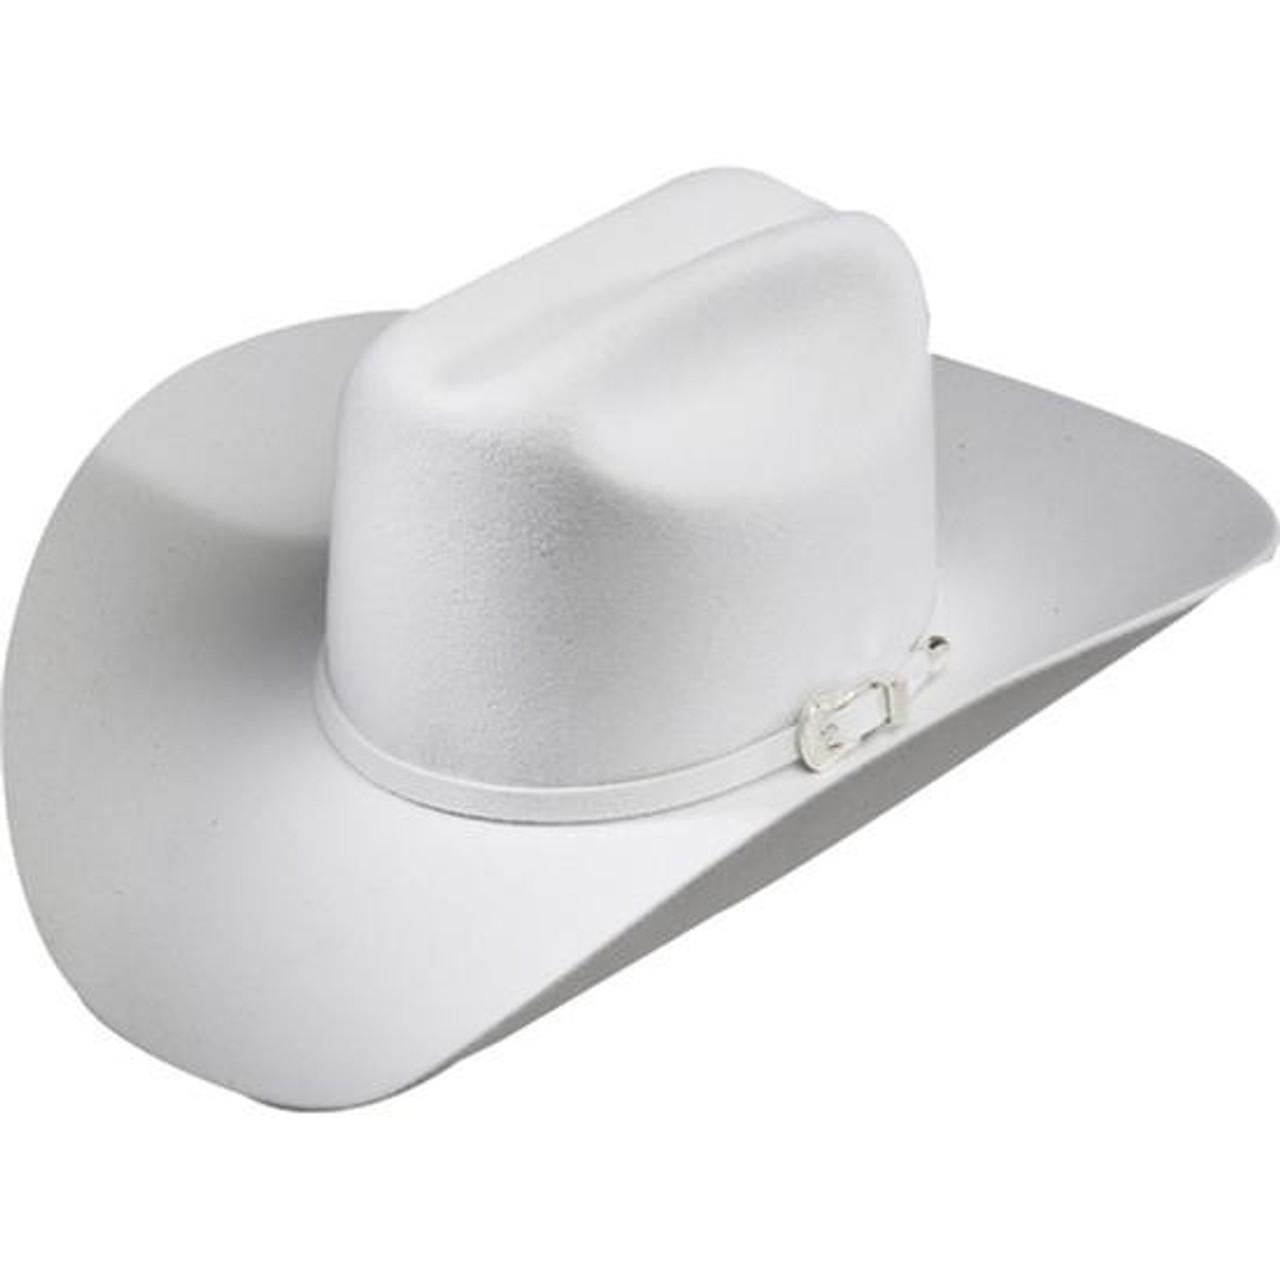 665bb04cf9156 BAILEY LIGHTNING 4X WHITE FUR FELT COWBOY HAT 4145 - Jackson s Western